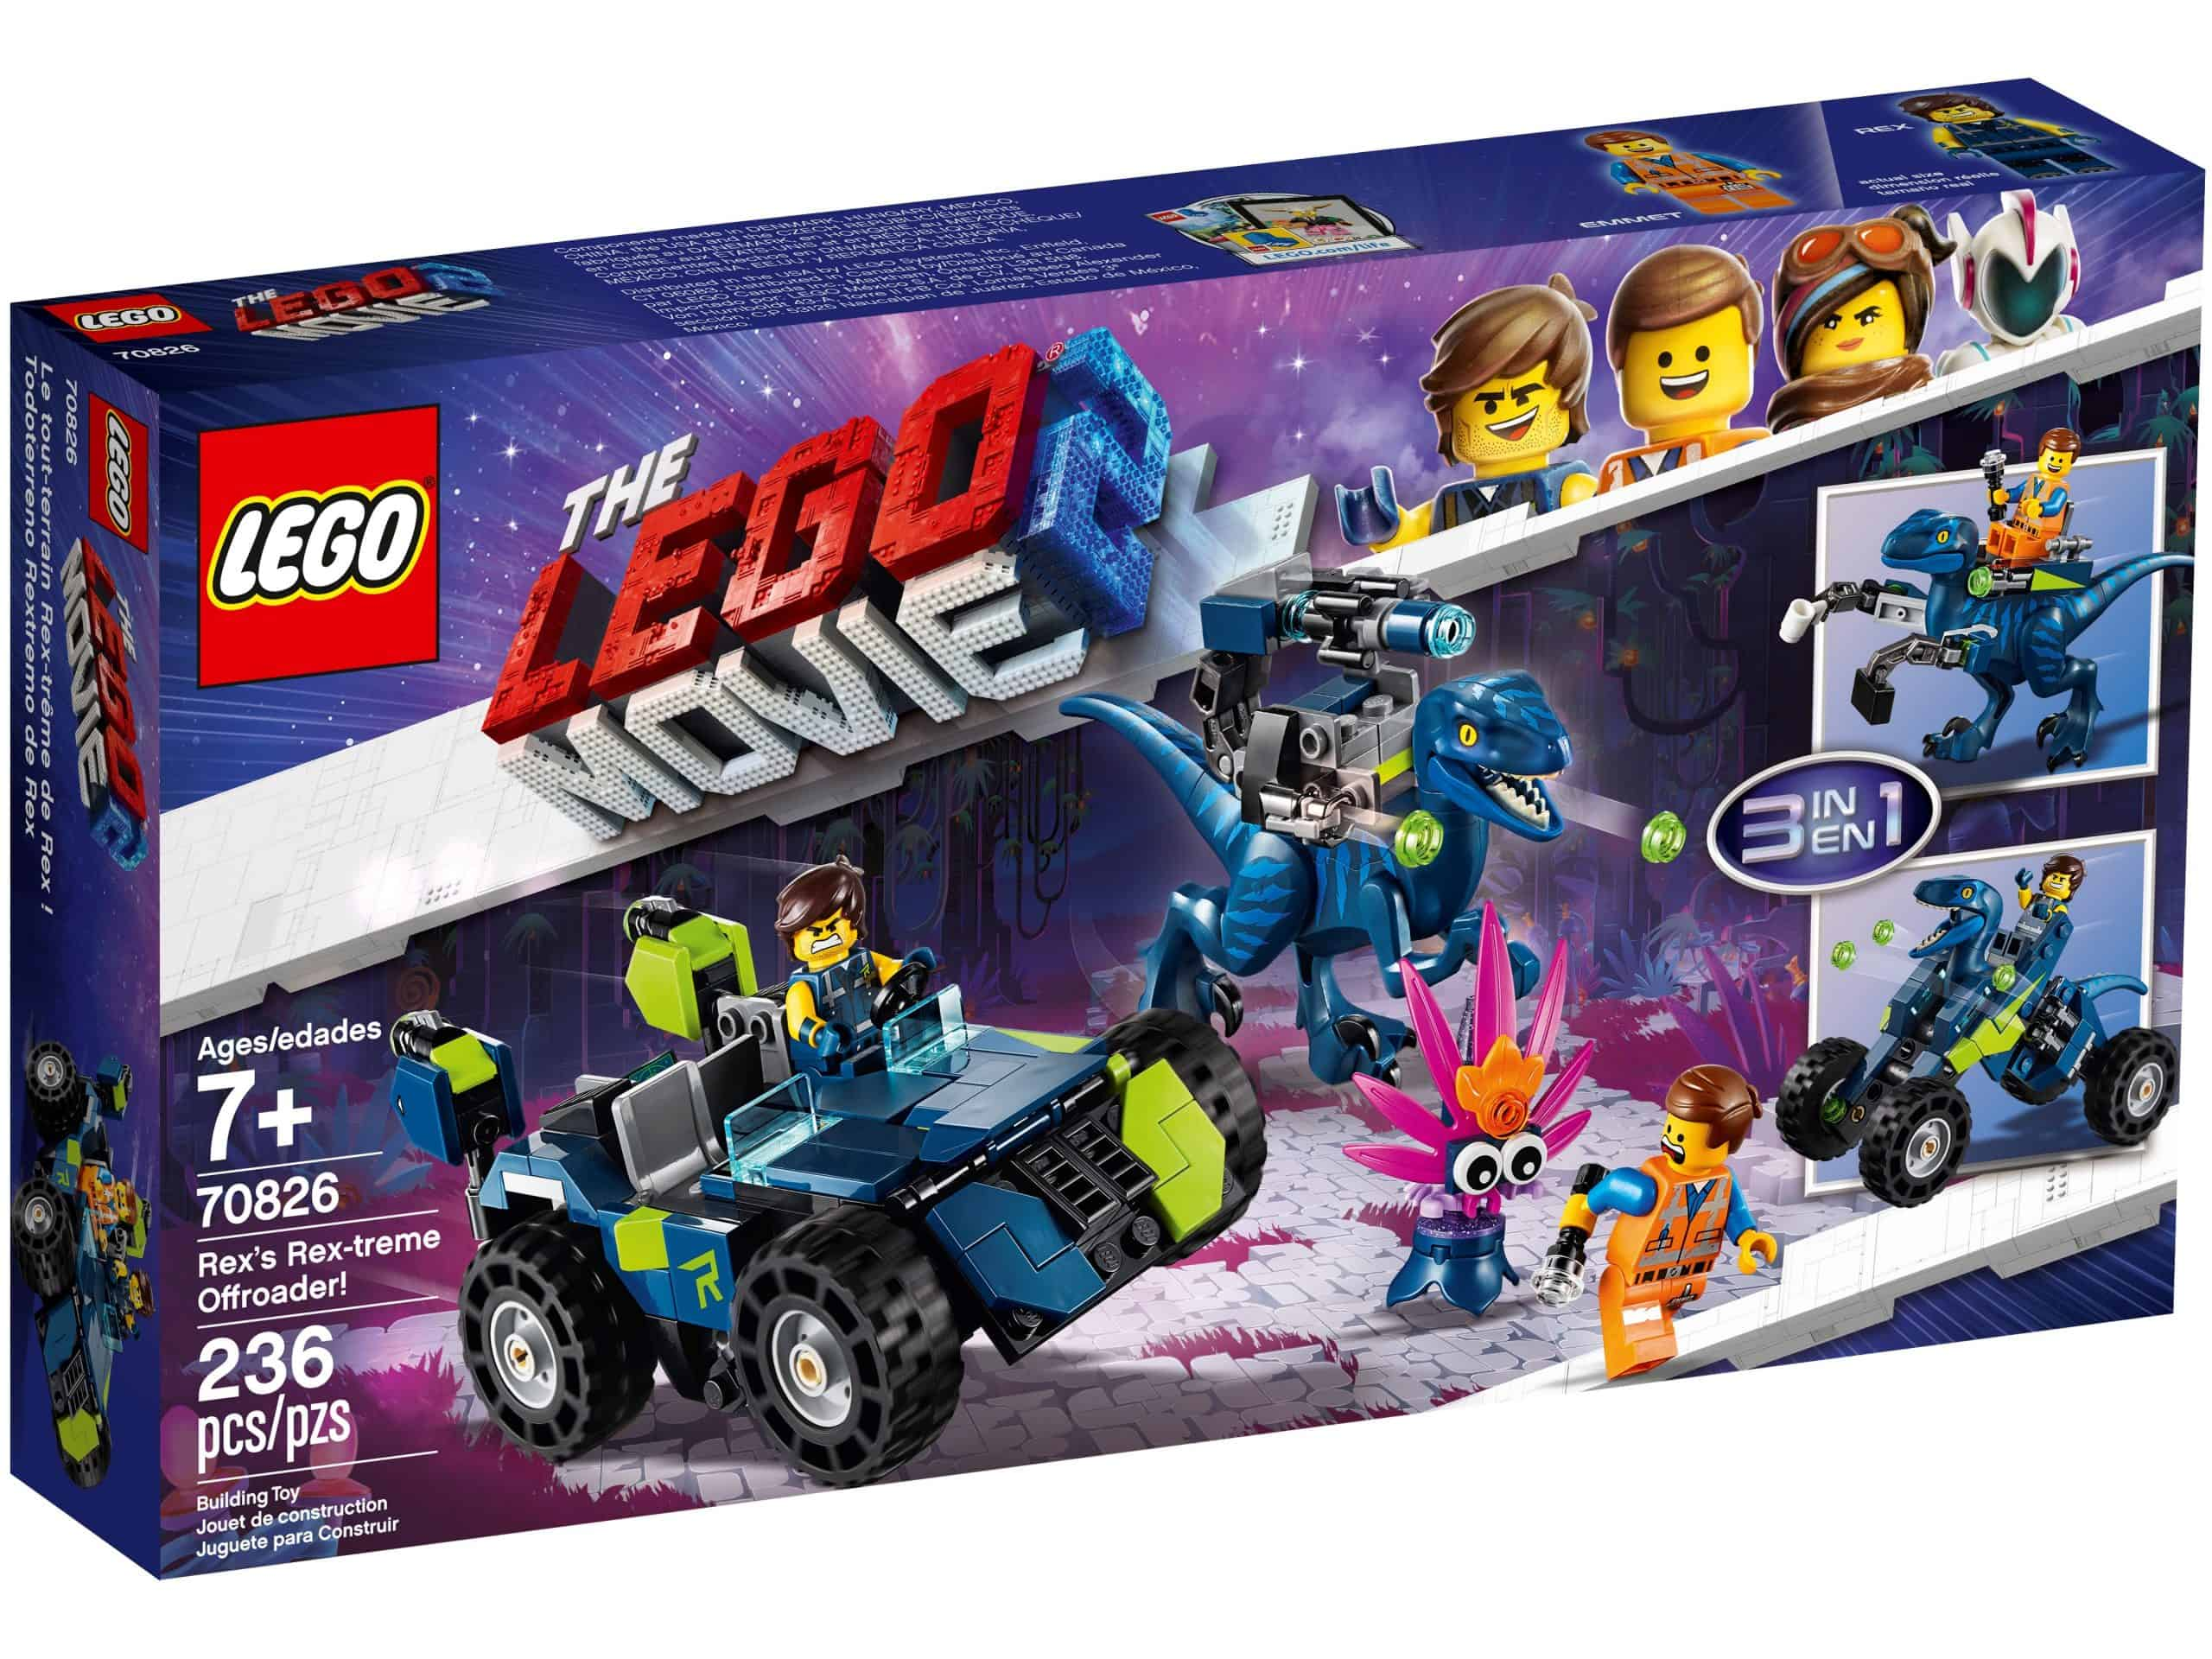 lego 70826 rex rextremes offroad fahrzeug scaled